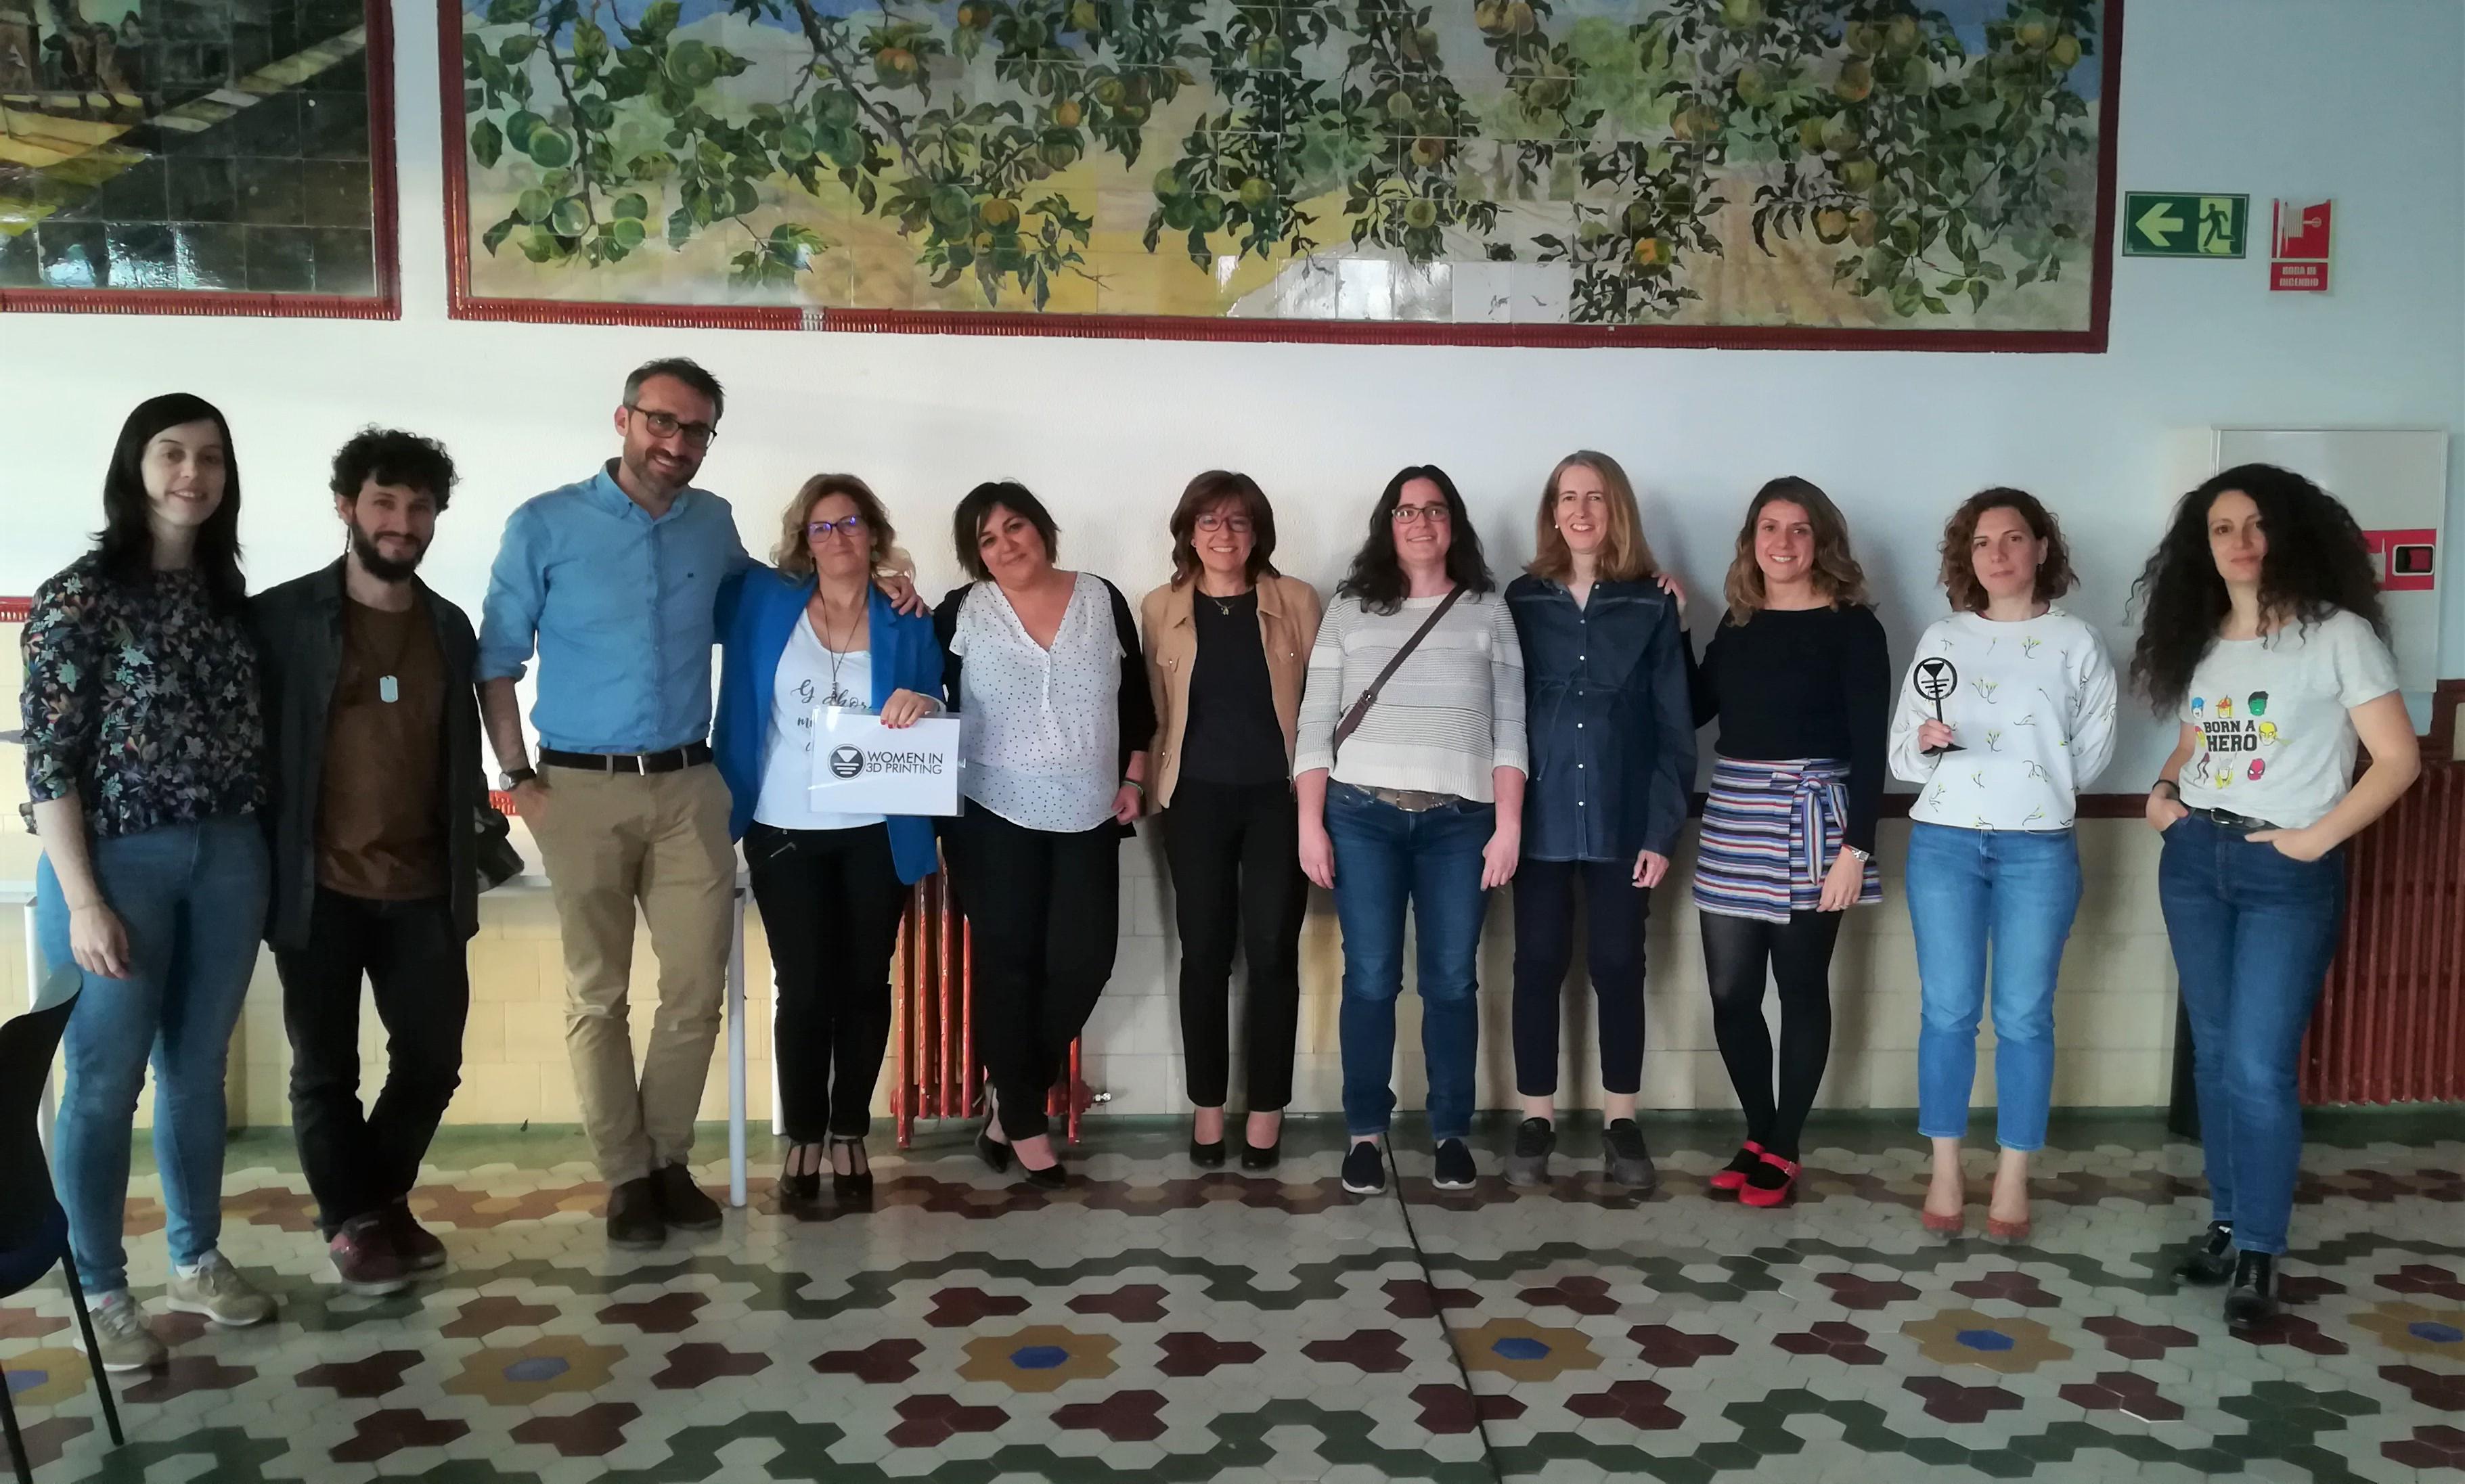 Reunión del grupo de Womenin3DPrinting en Madrid